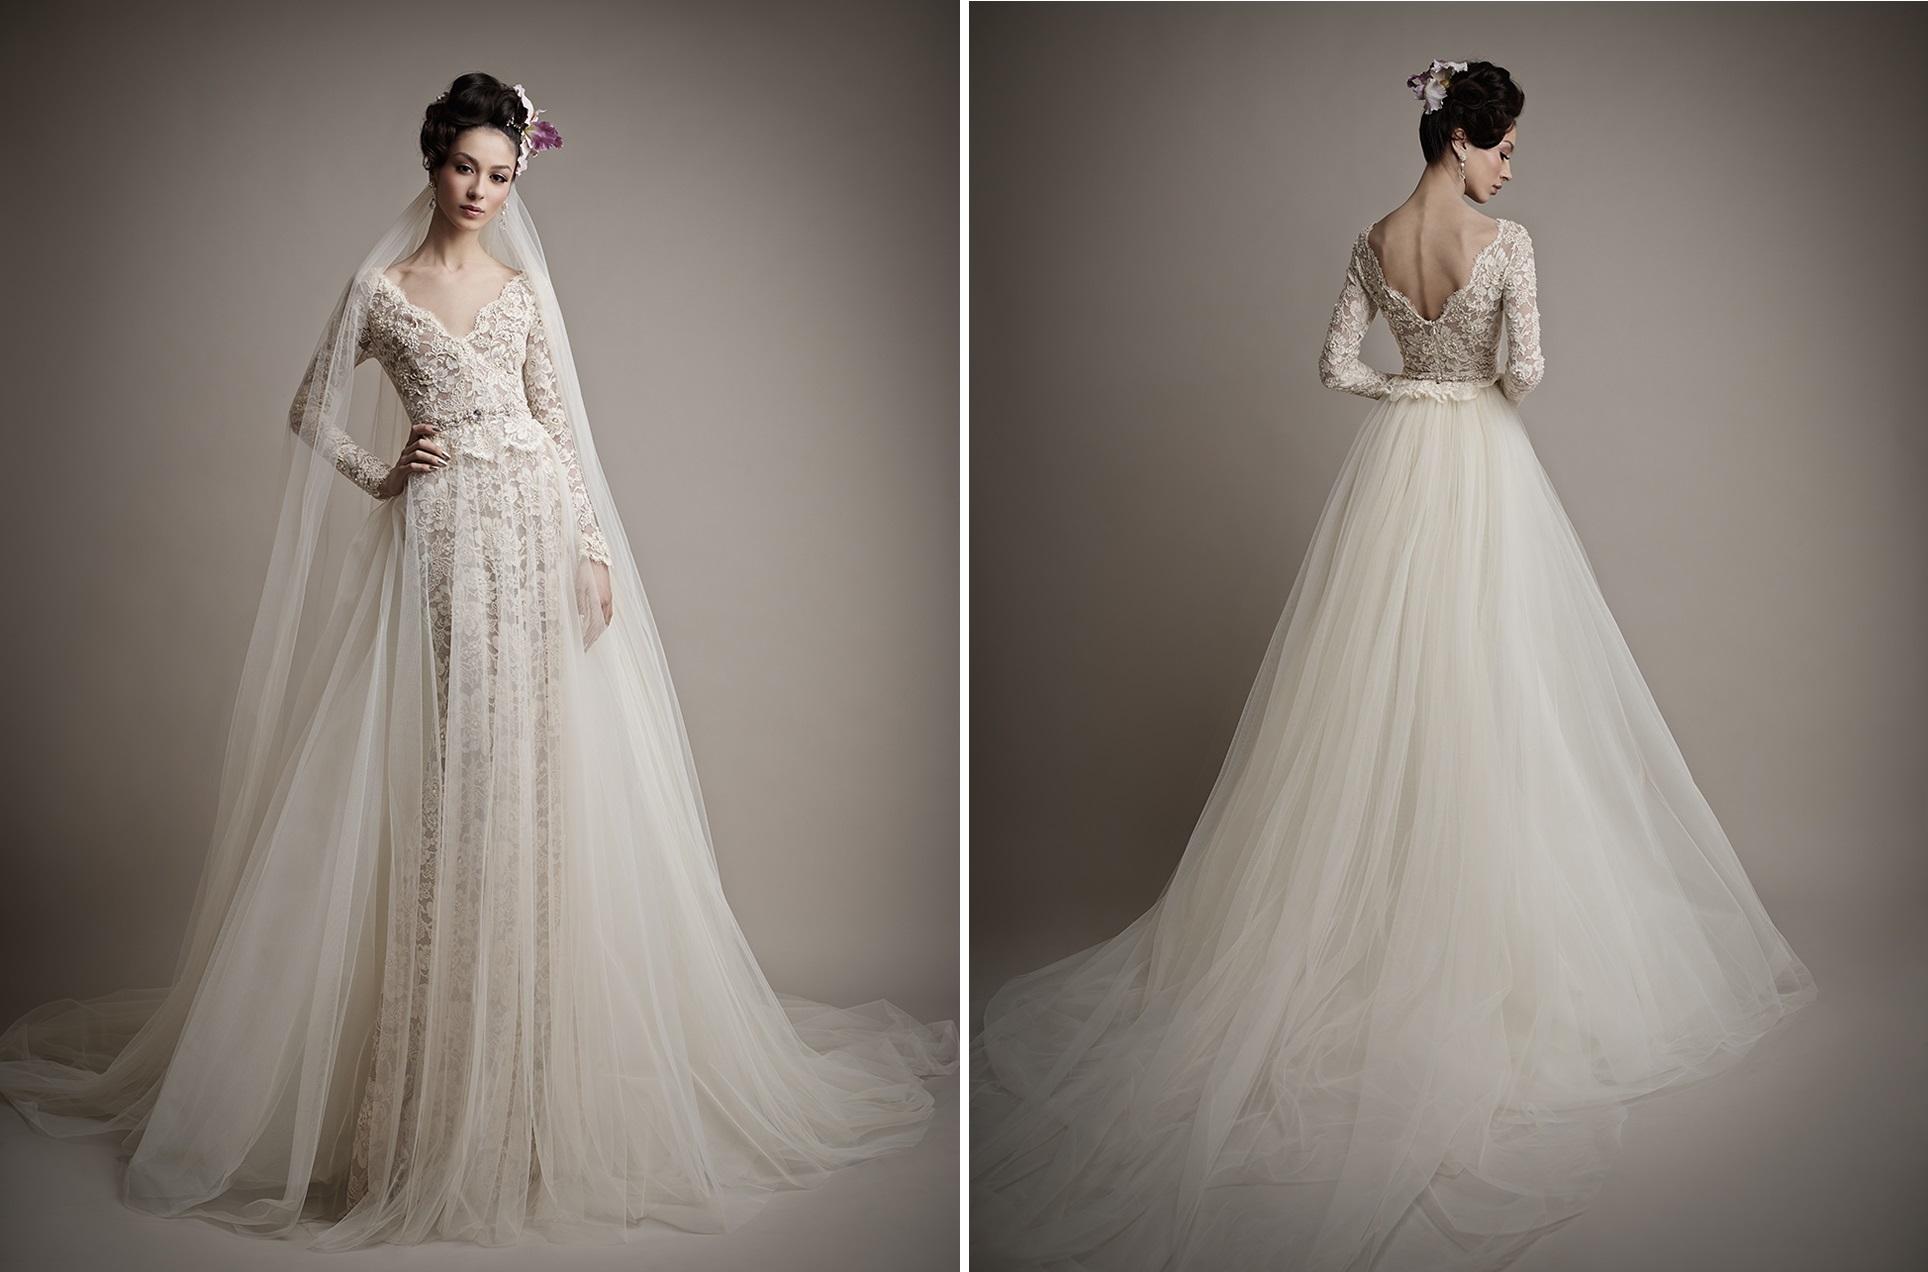 Ersa Atelier's 2015 Bridal Collection - Yatie Wedding Dress